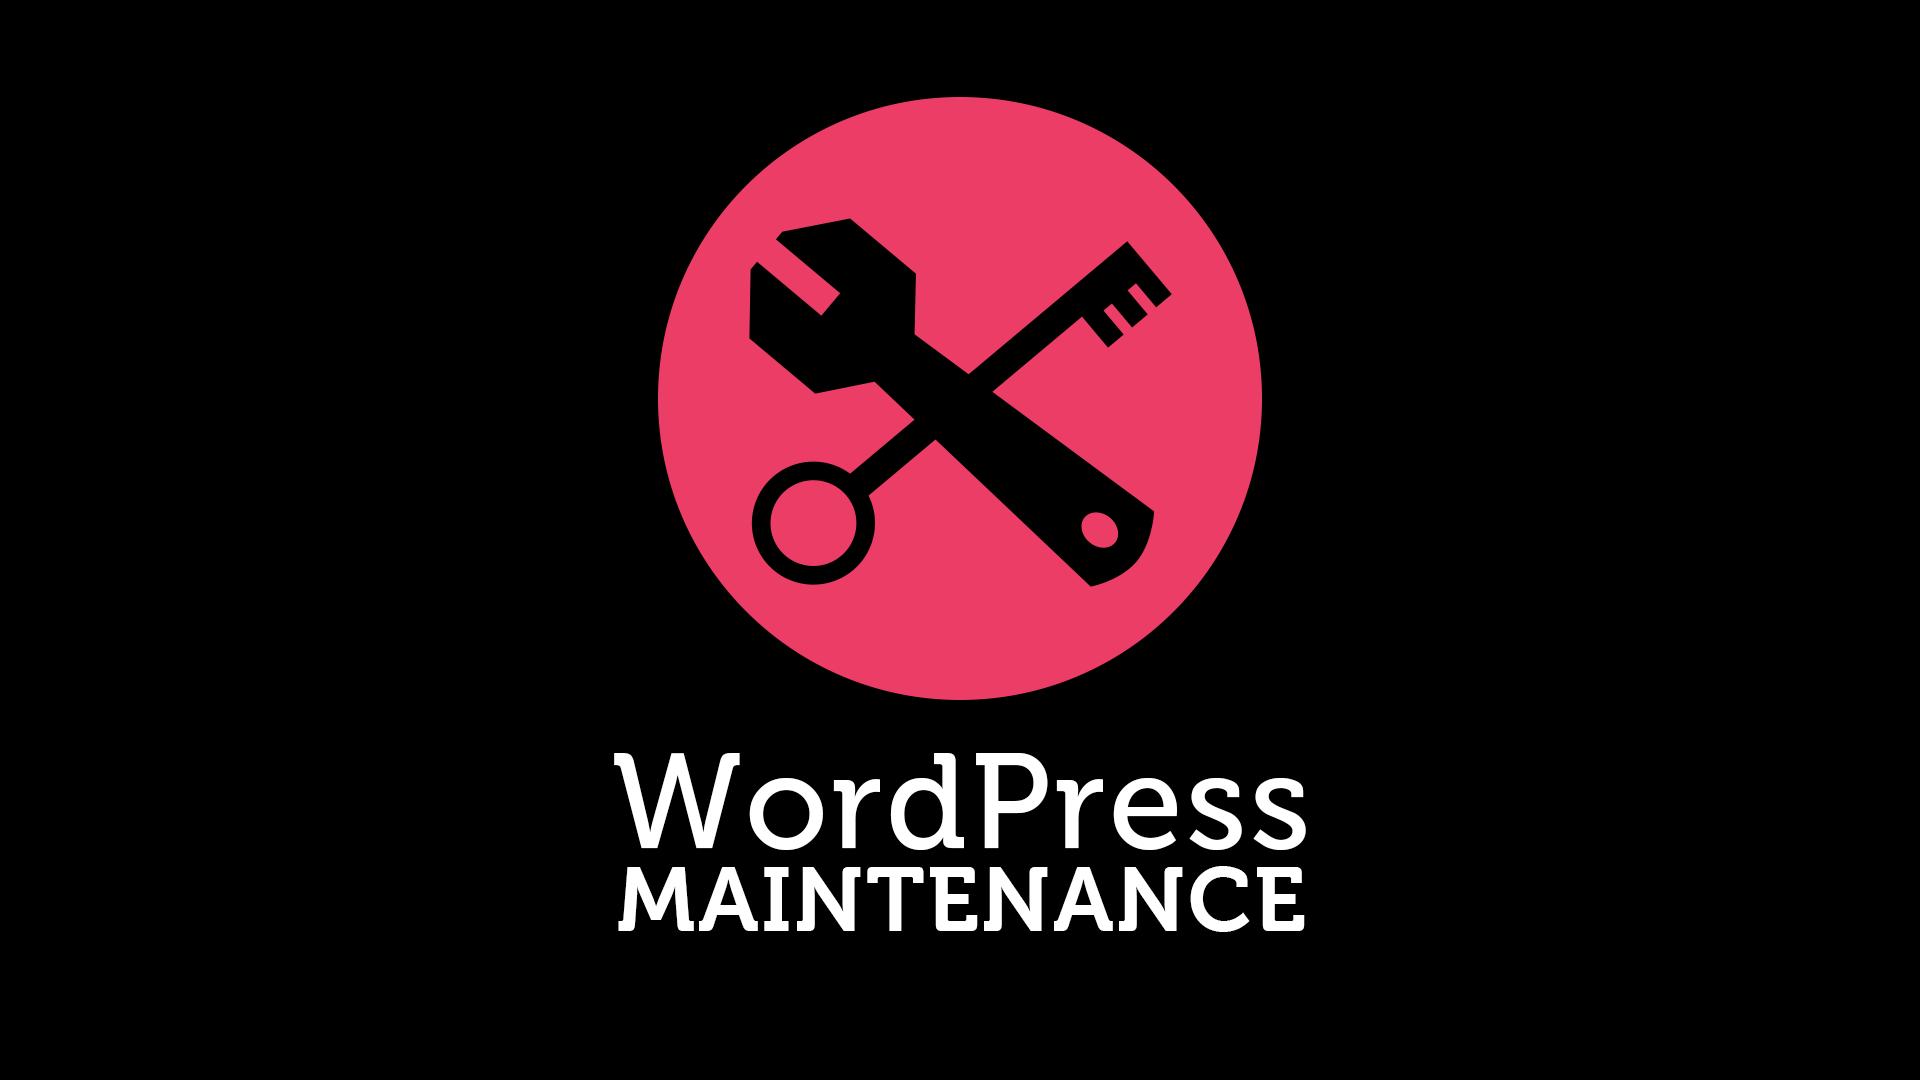 WordPress Maintenance - Mark Robinson - Digital Creative